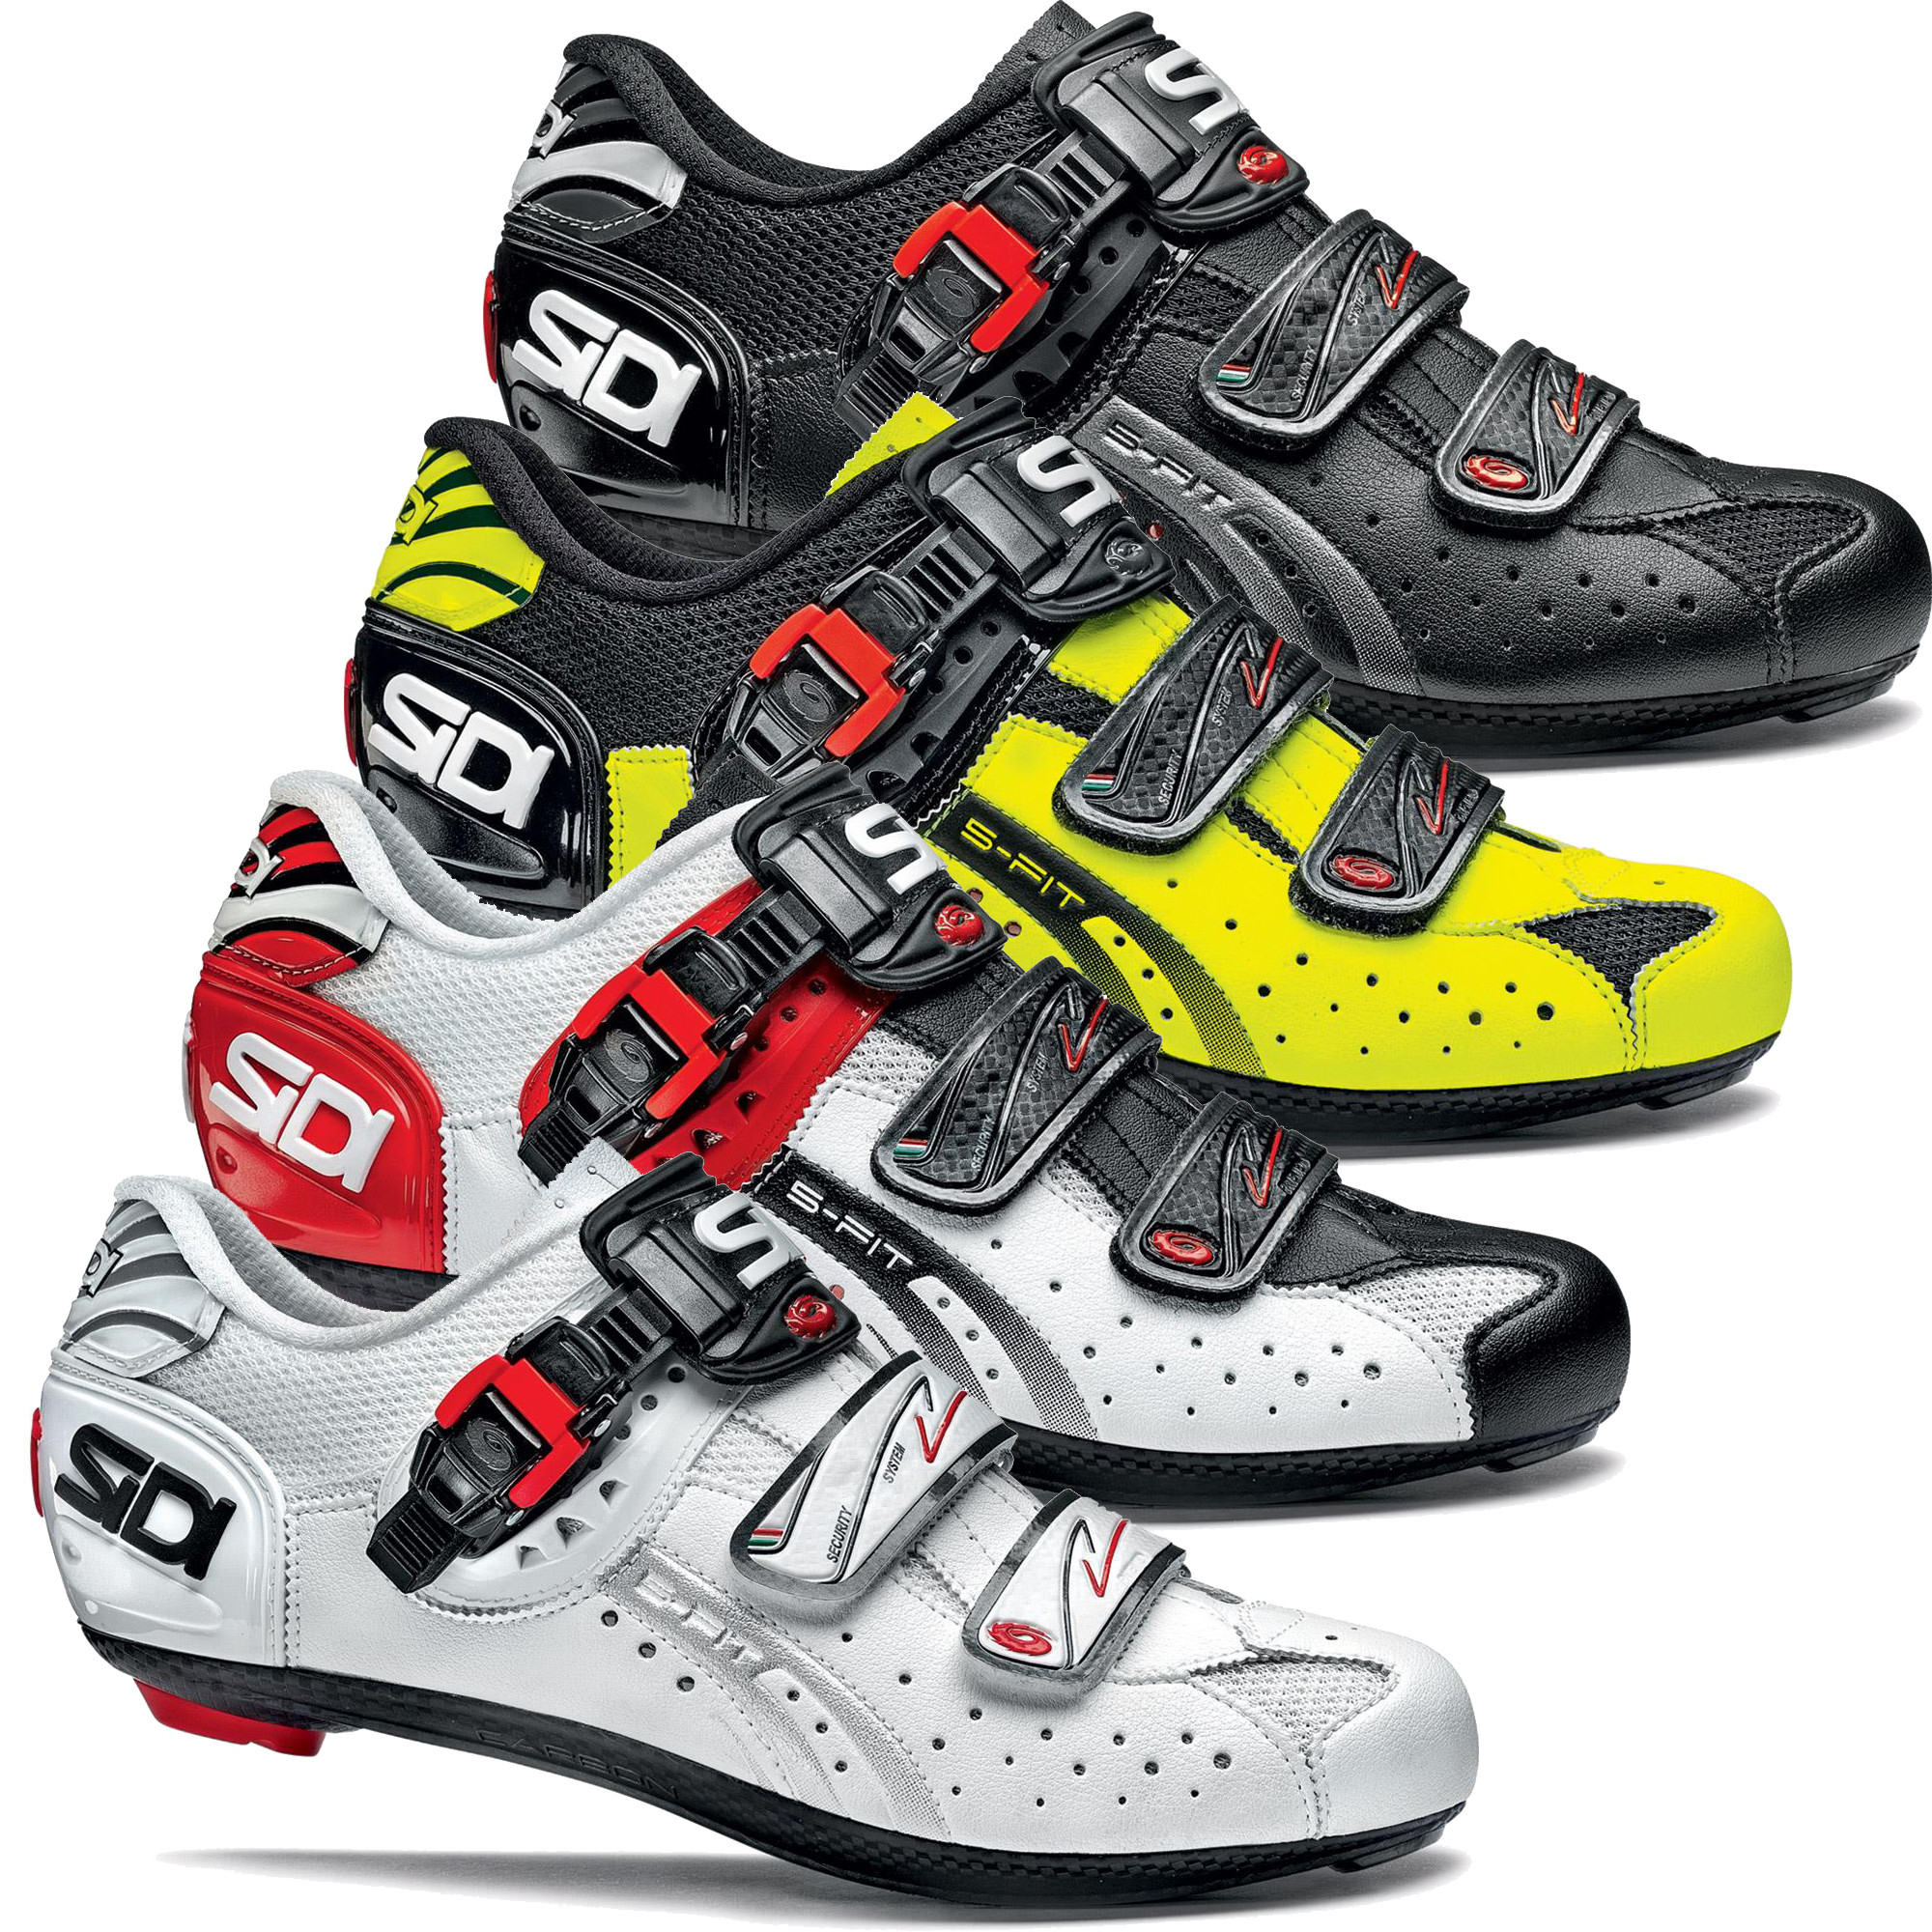 Sidi Genius 5-Fit Carbon Road Shoe